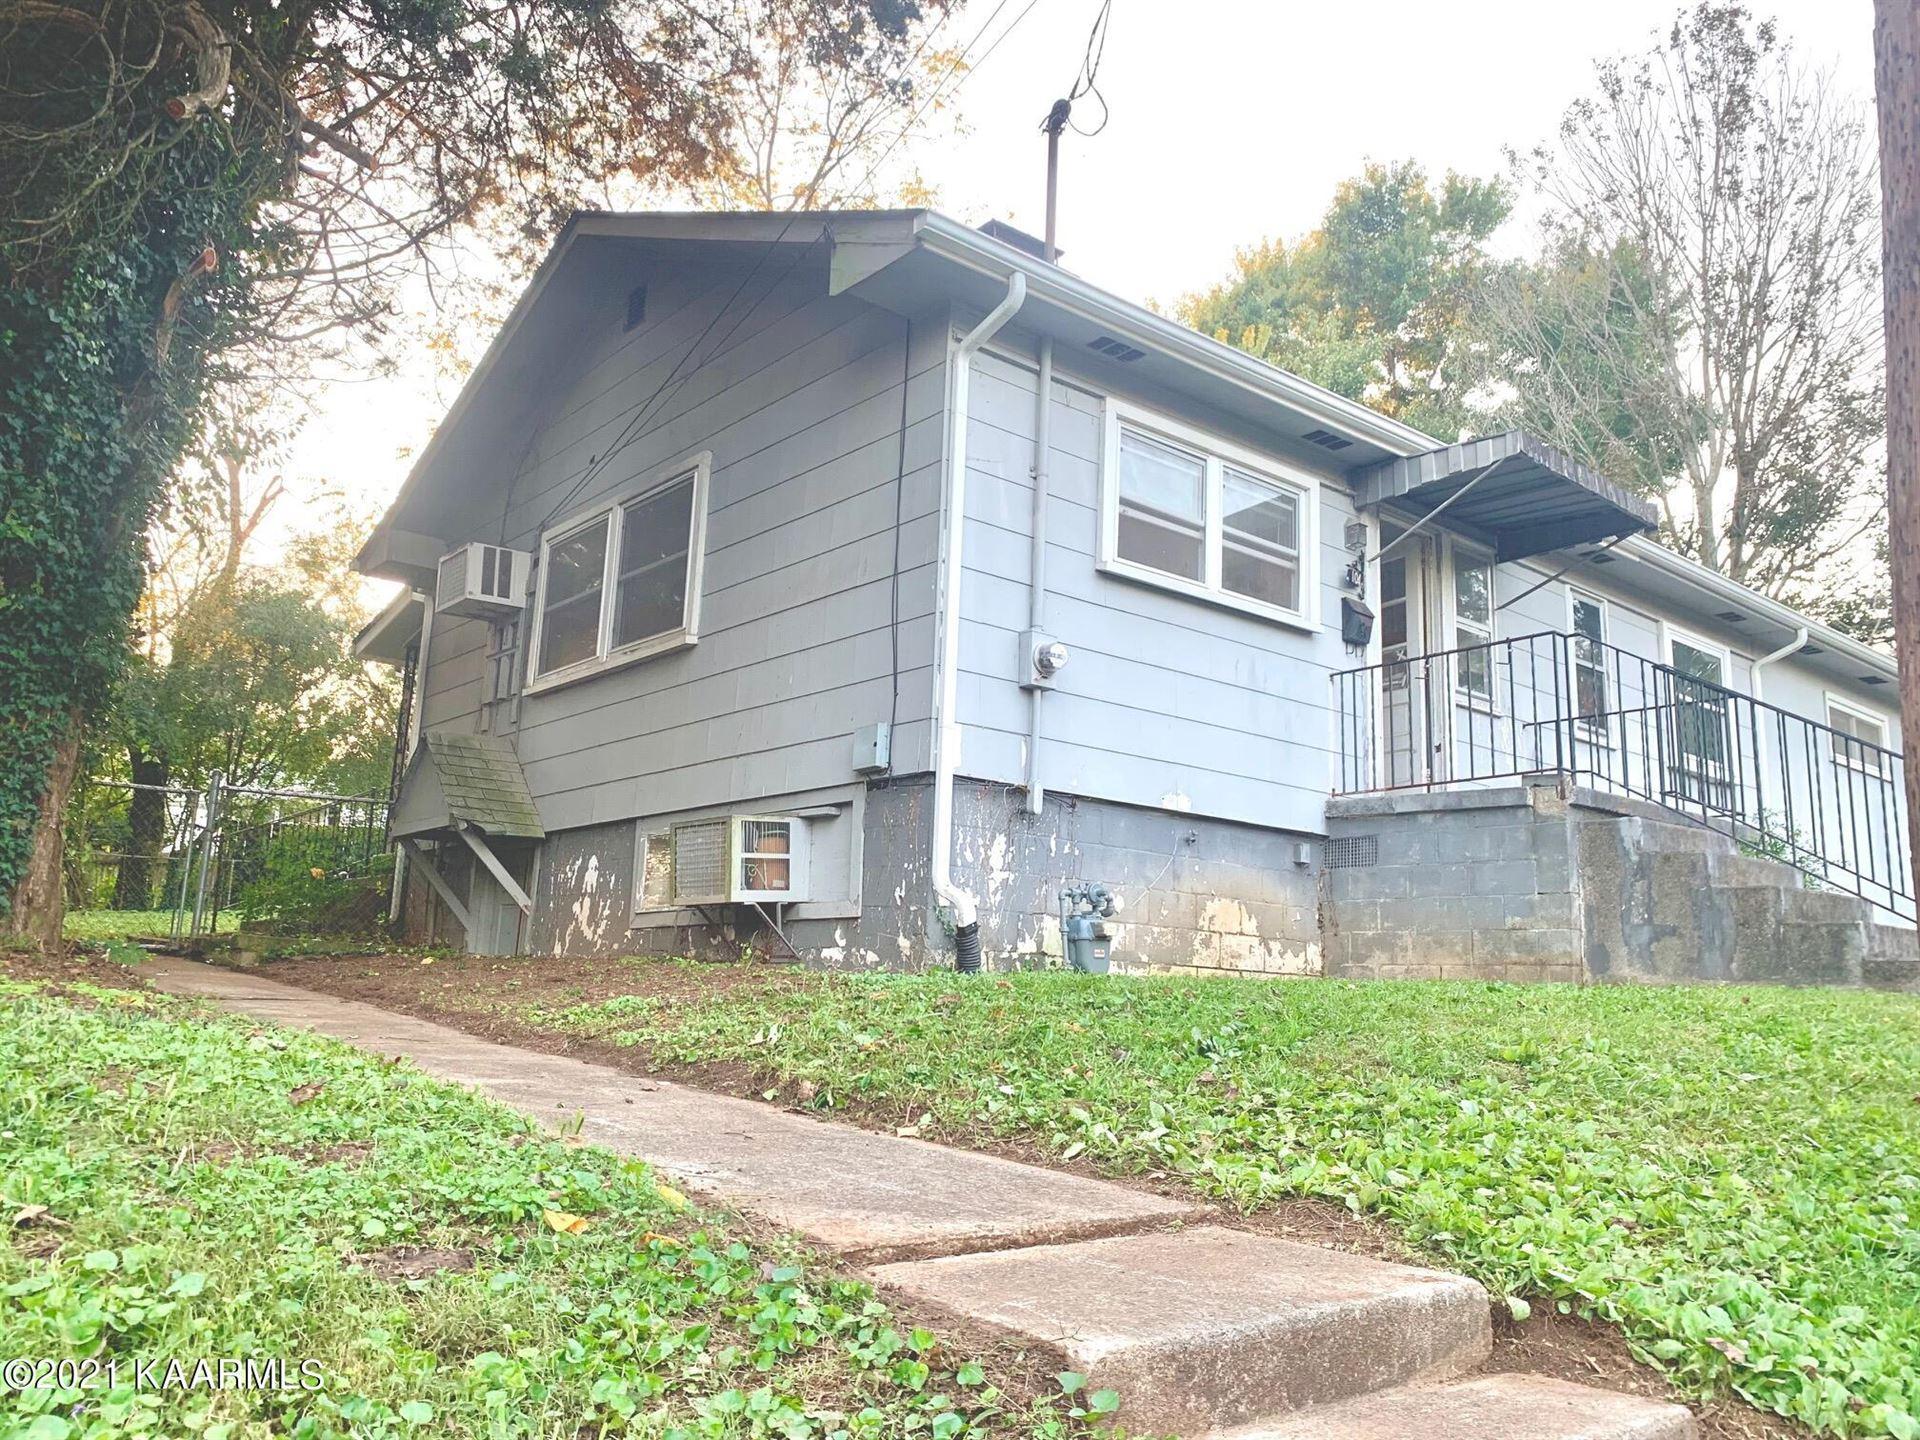 Photo of 104 Verbena Rd, Oak Ridge, TN 37830 (MLS # 1170907)